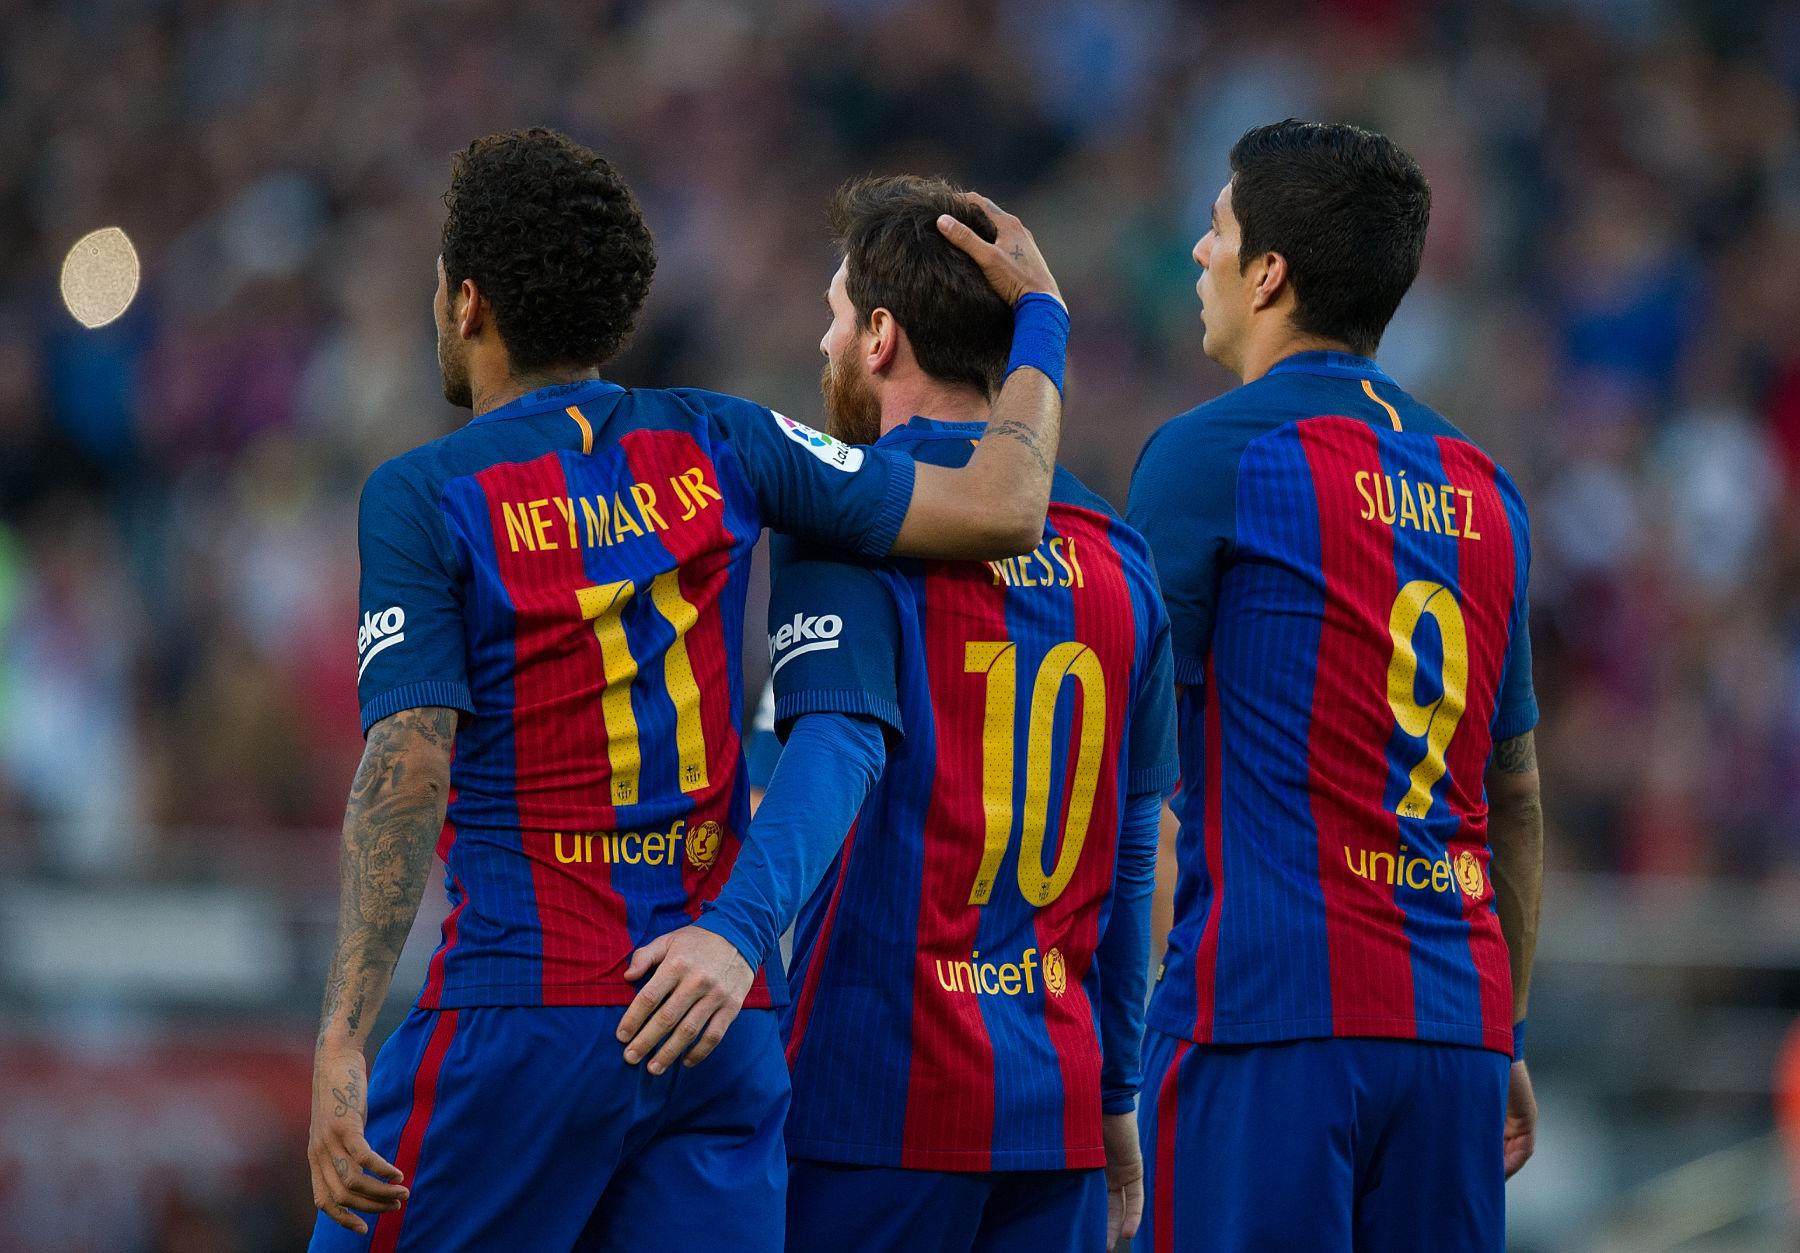 Neymar Reunites With Messi And Suarez In Uruguay Psg Talk